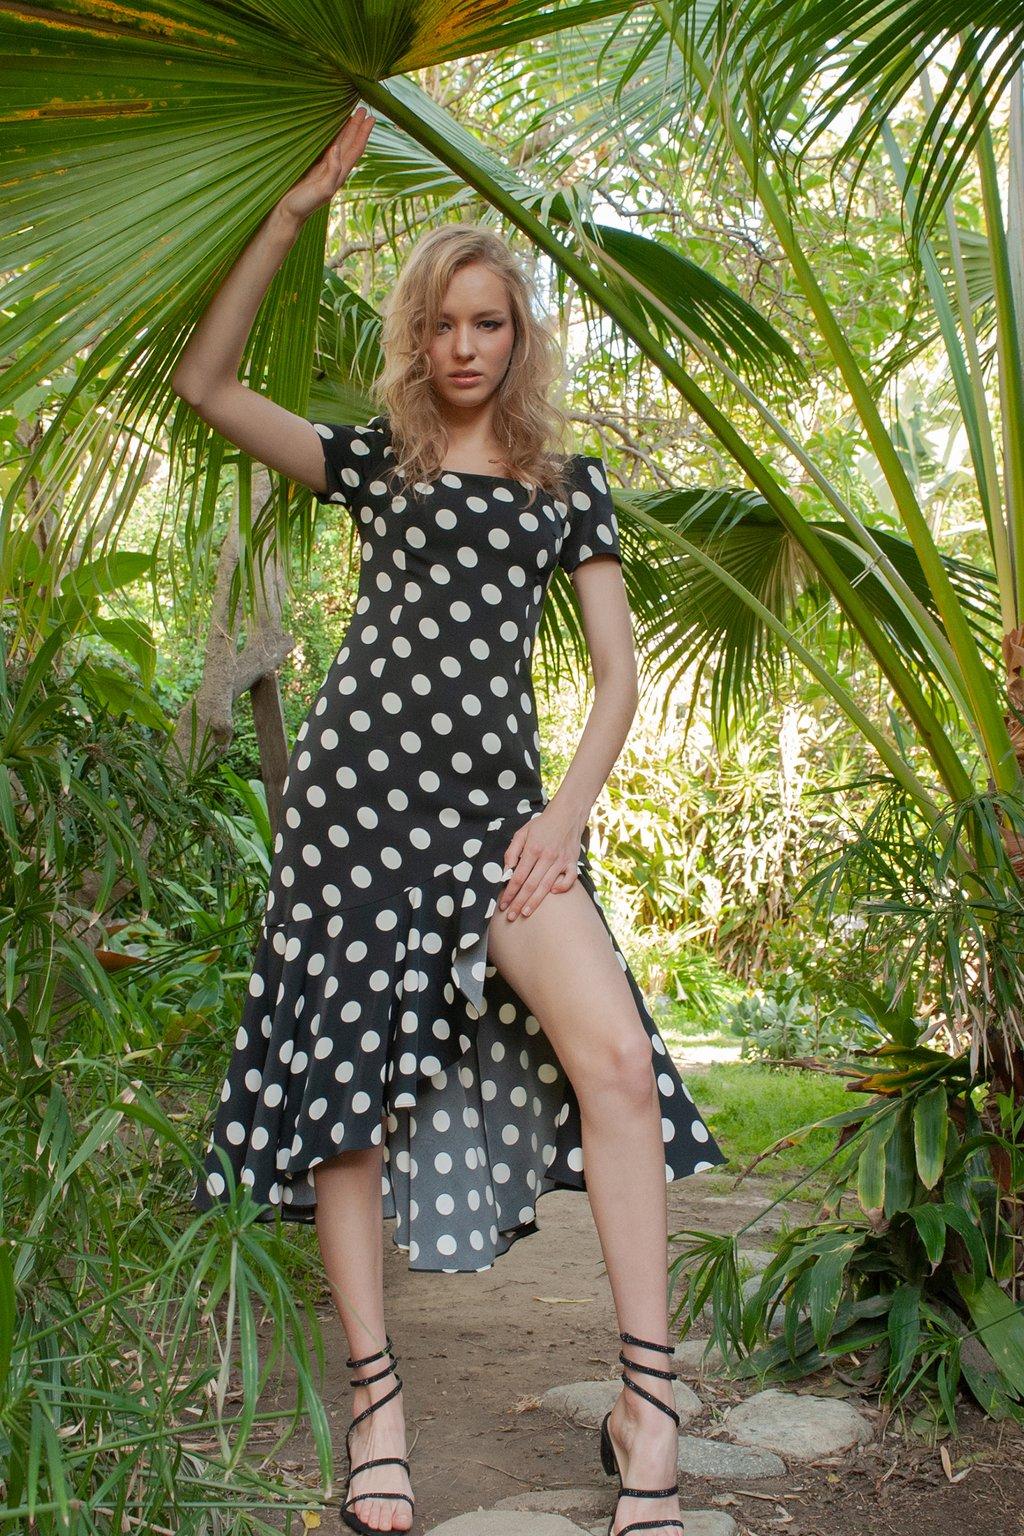 Ada Polka Dot Dress by J.ING women's fashion clothing